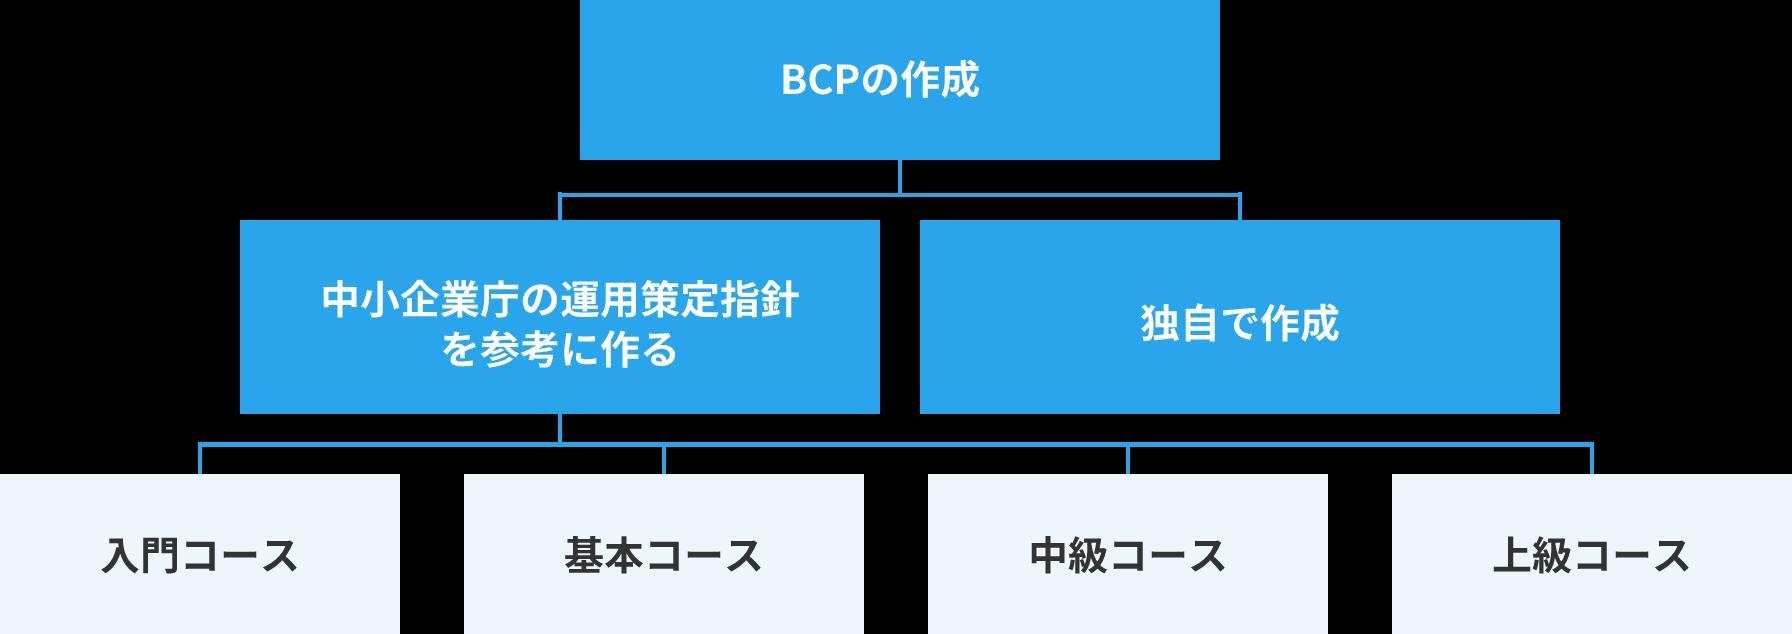 BCPの作成 - 中小企業庁の運用策定指針を参考に作る or 独自で作成